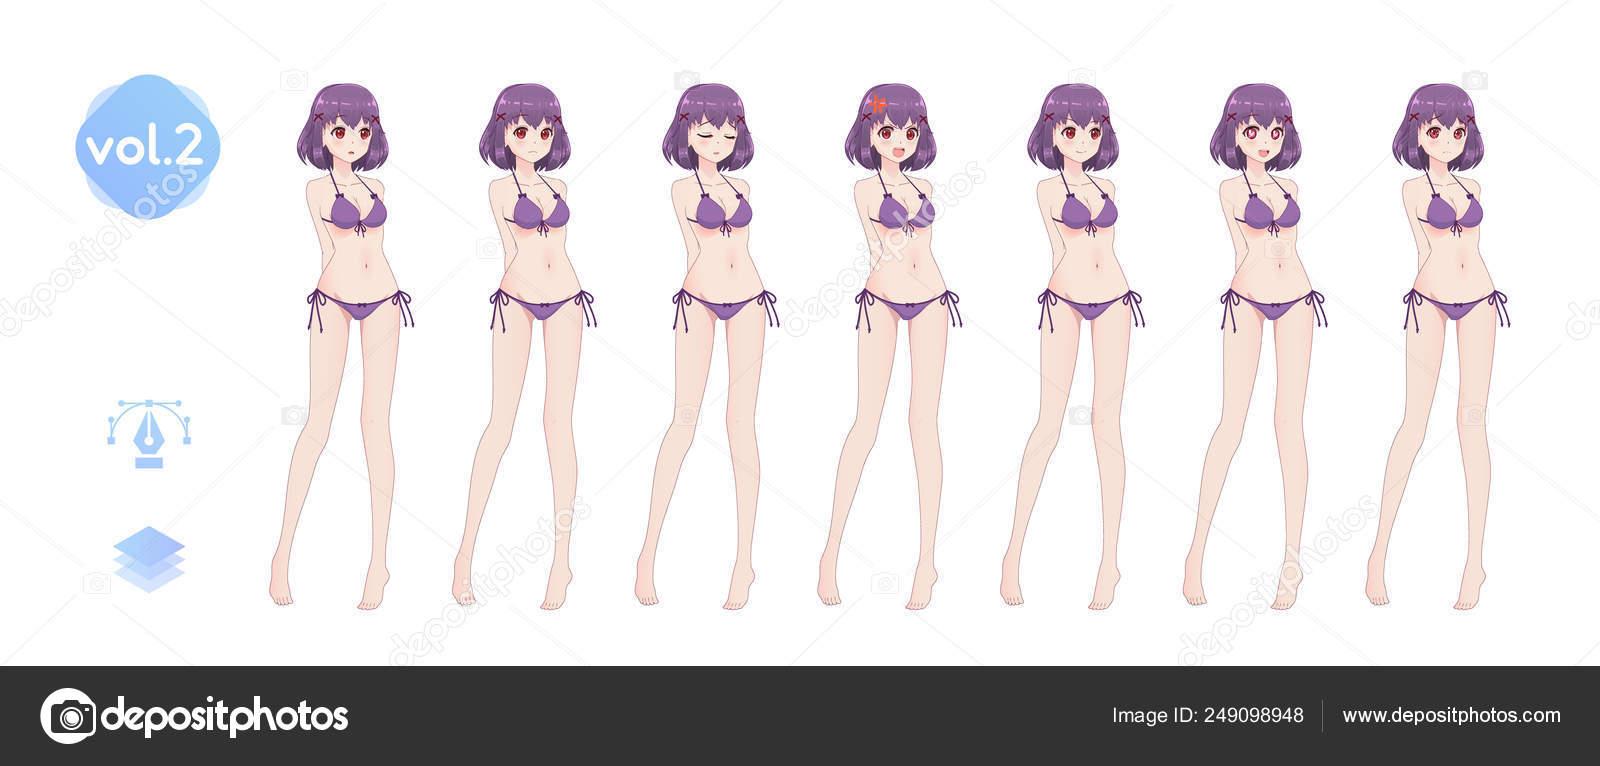 MangaEn Verano Chica Anime Bikini De Baño Traje Un 0mNn8vOw